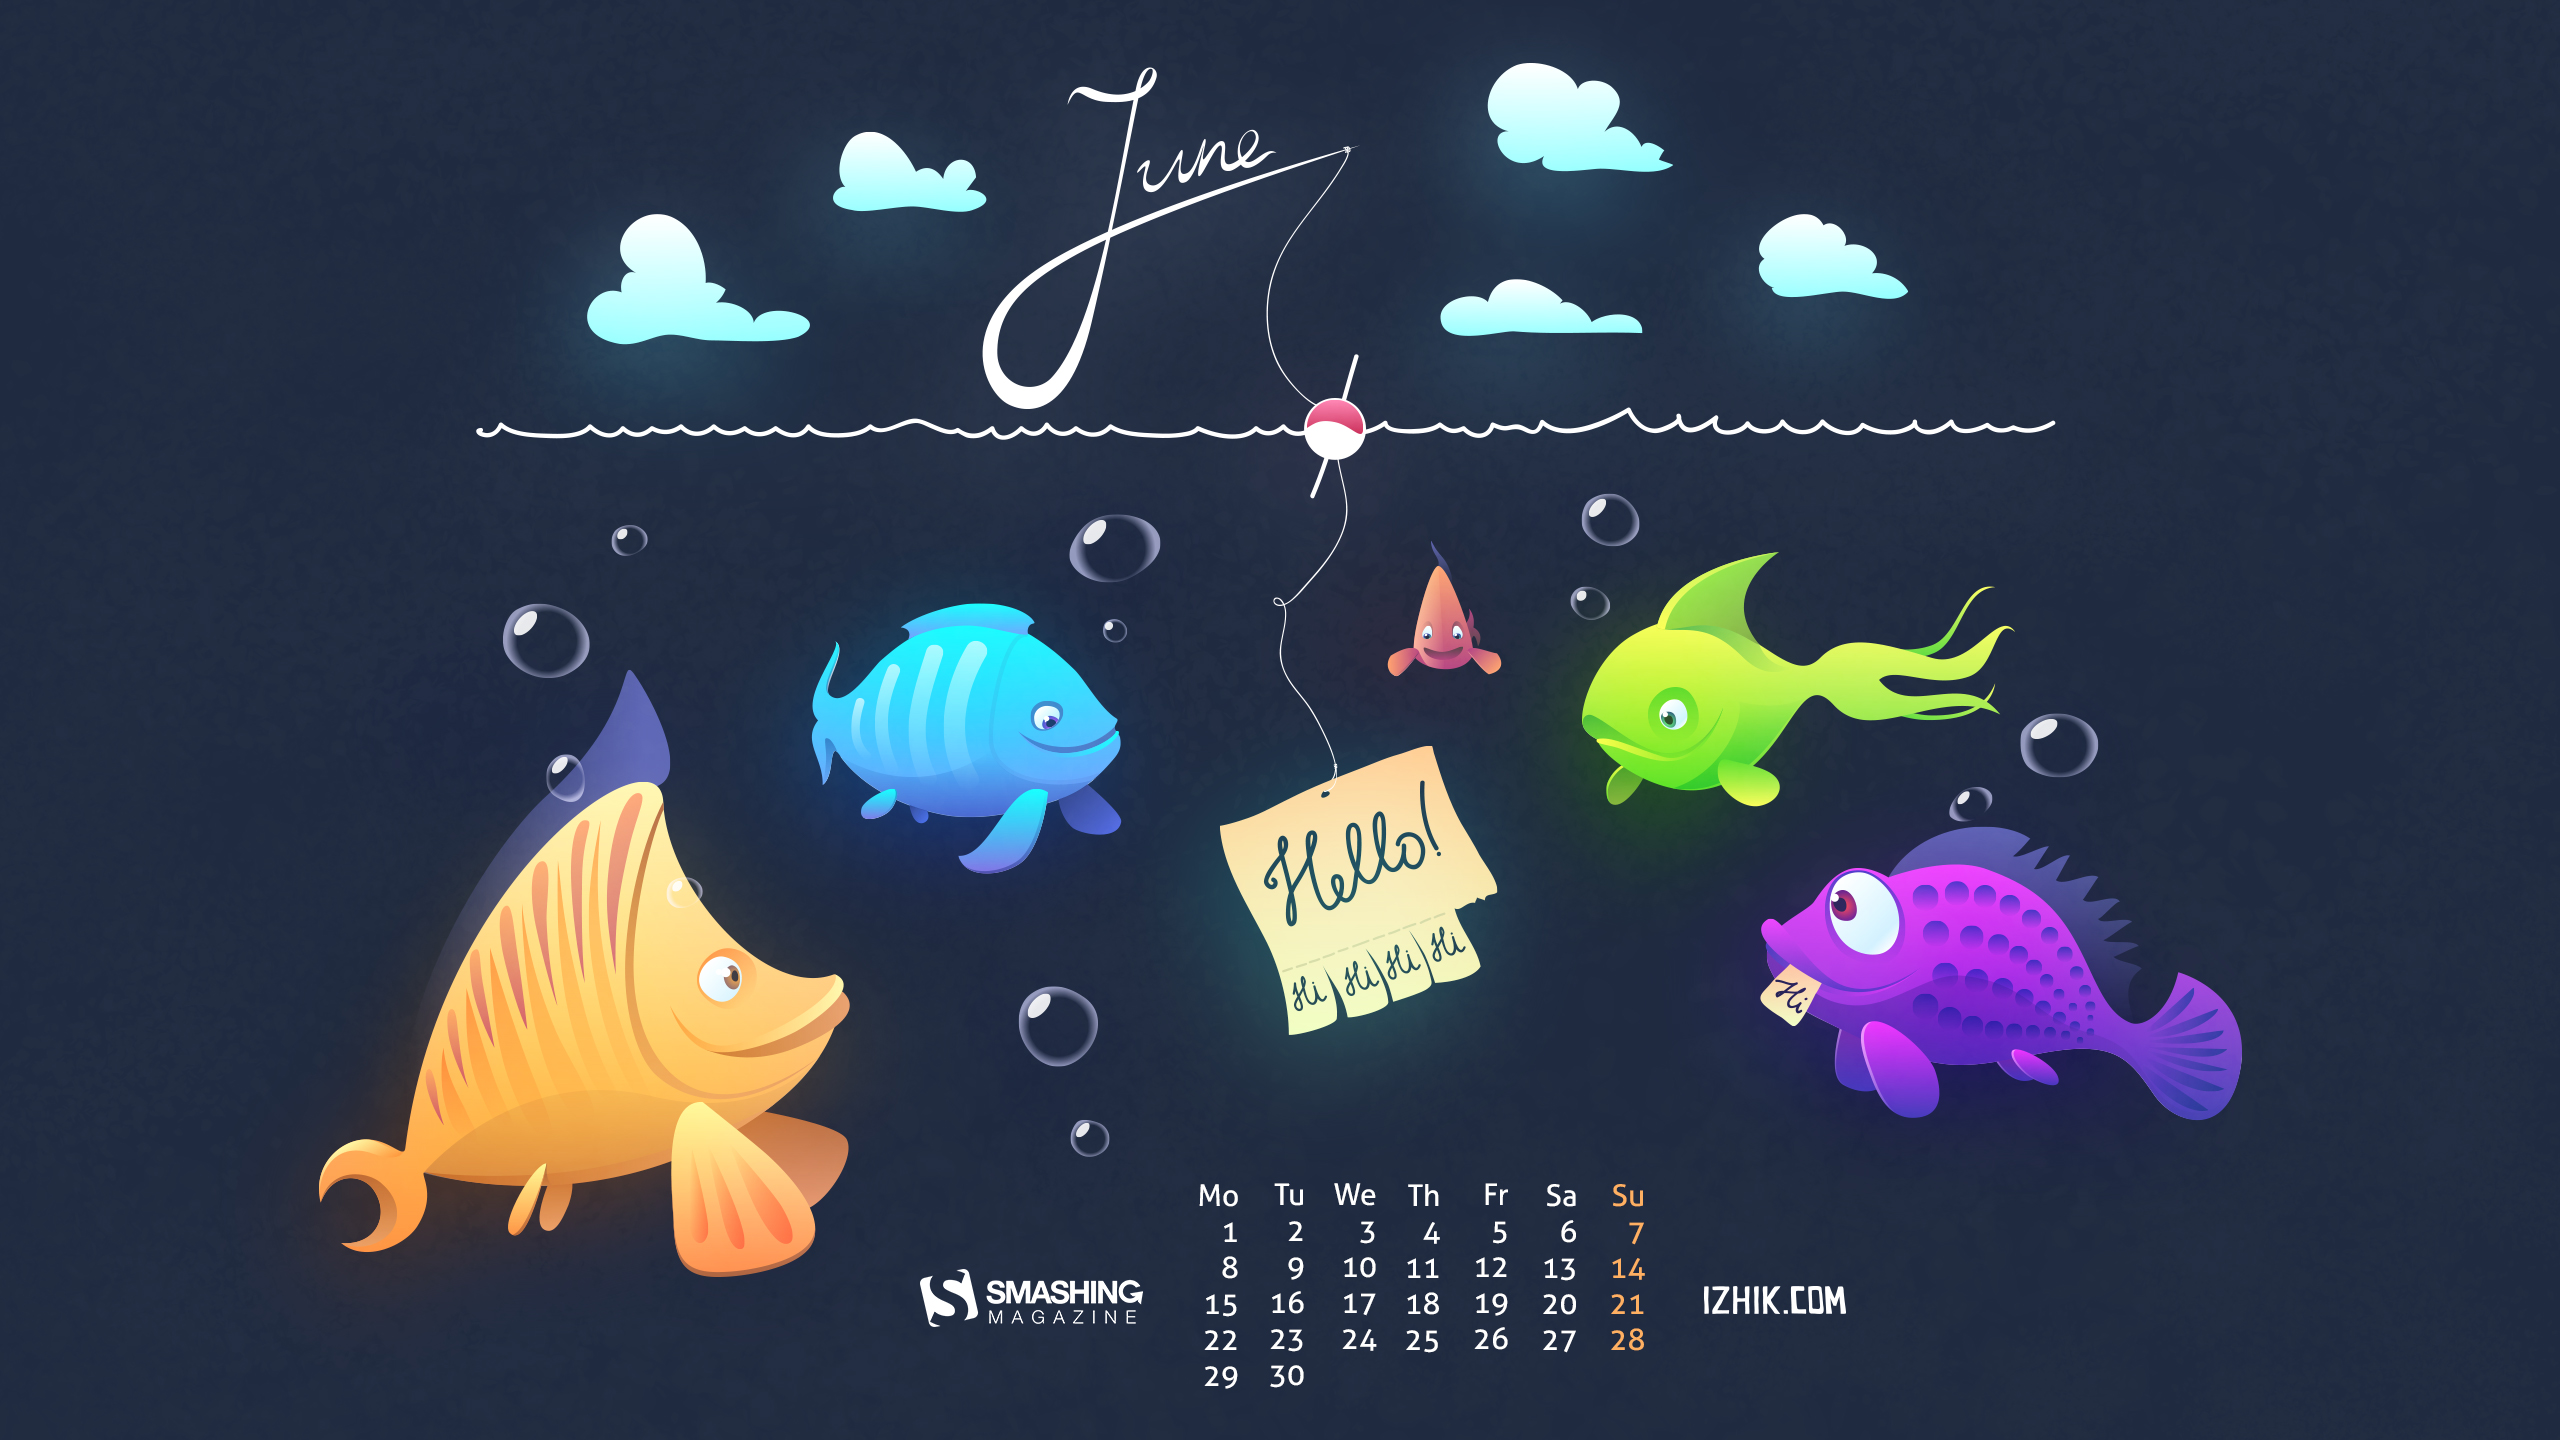 Desktop Wallpaper Calendars June 2015 Smashing Magazine 2560x1440